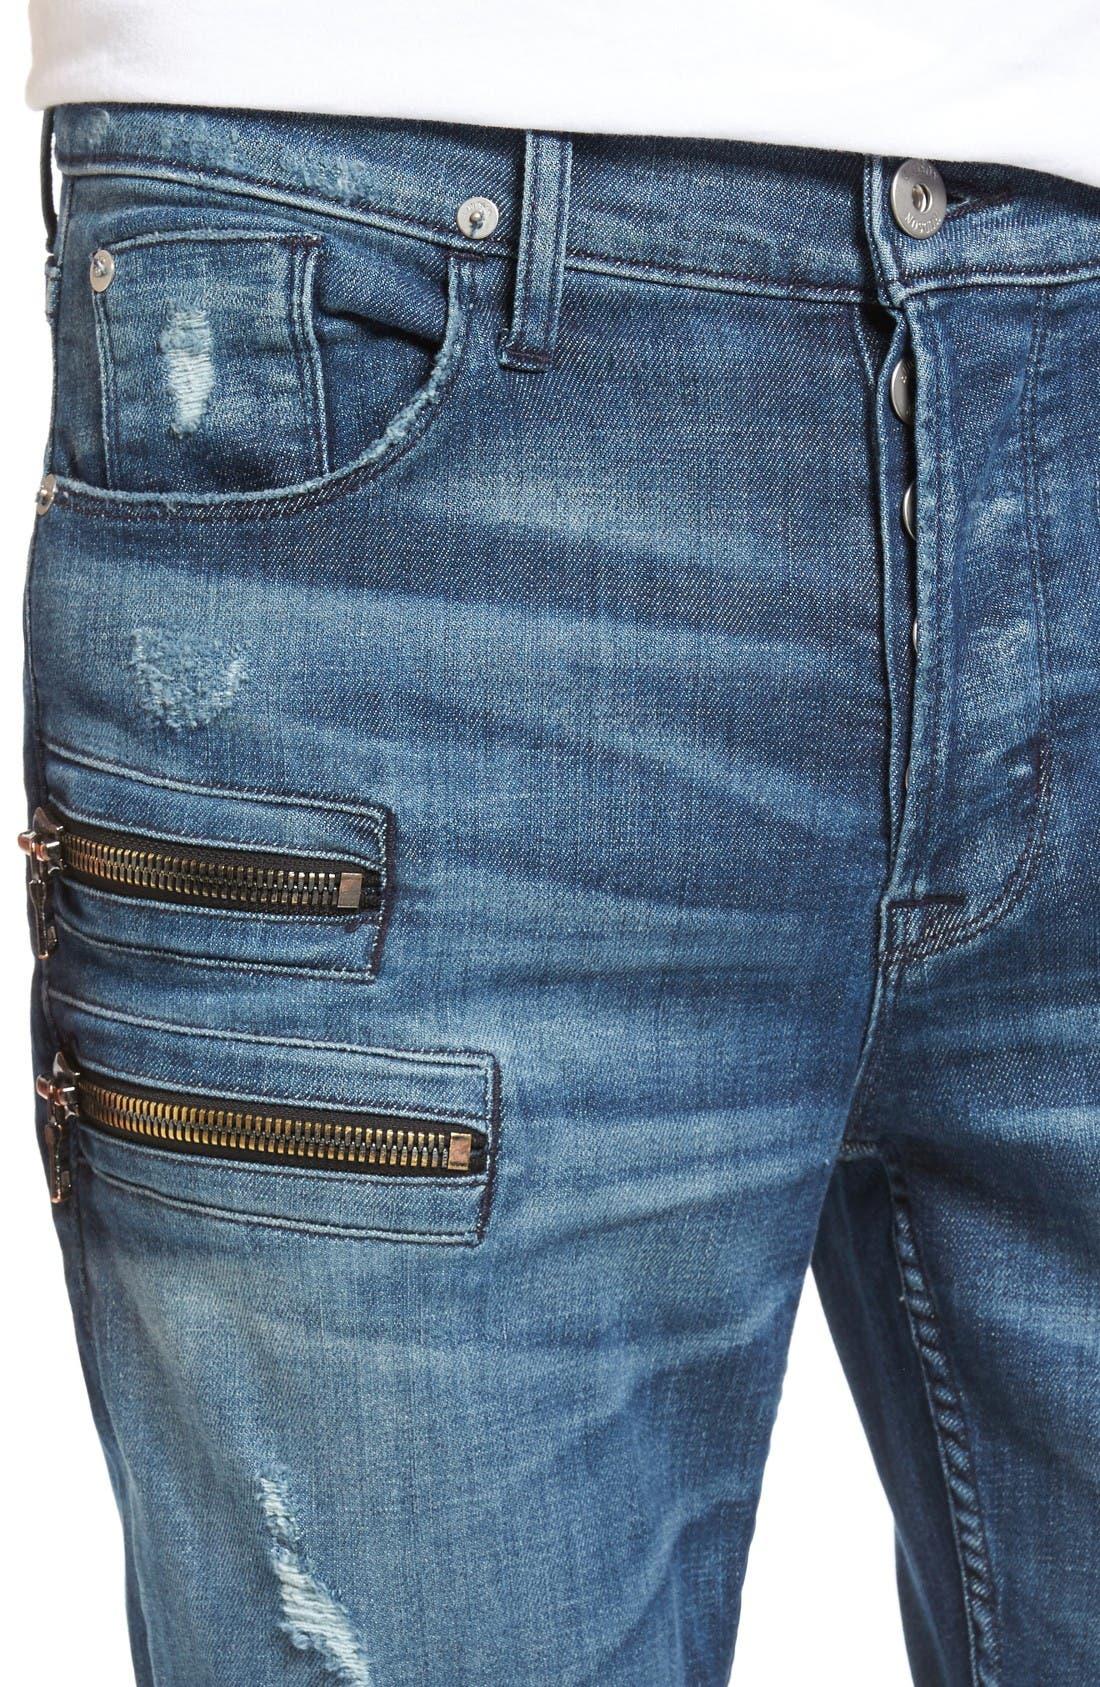 Broderick Biker Skinny Fit Jeans,                             Alternate thumbnail 4, color,                             Hayday 2